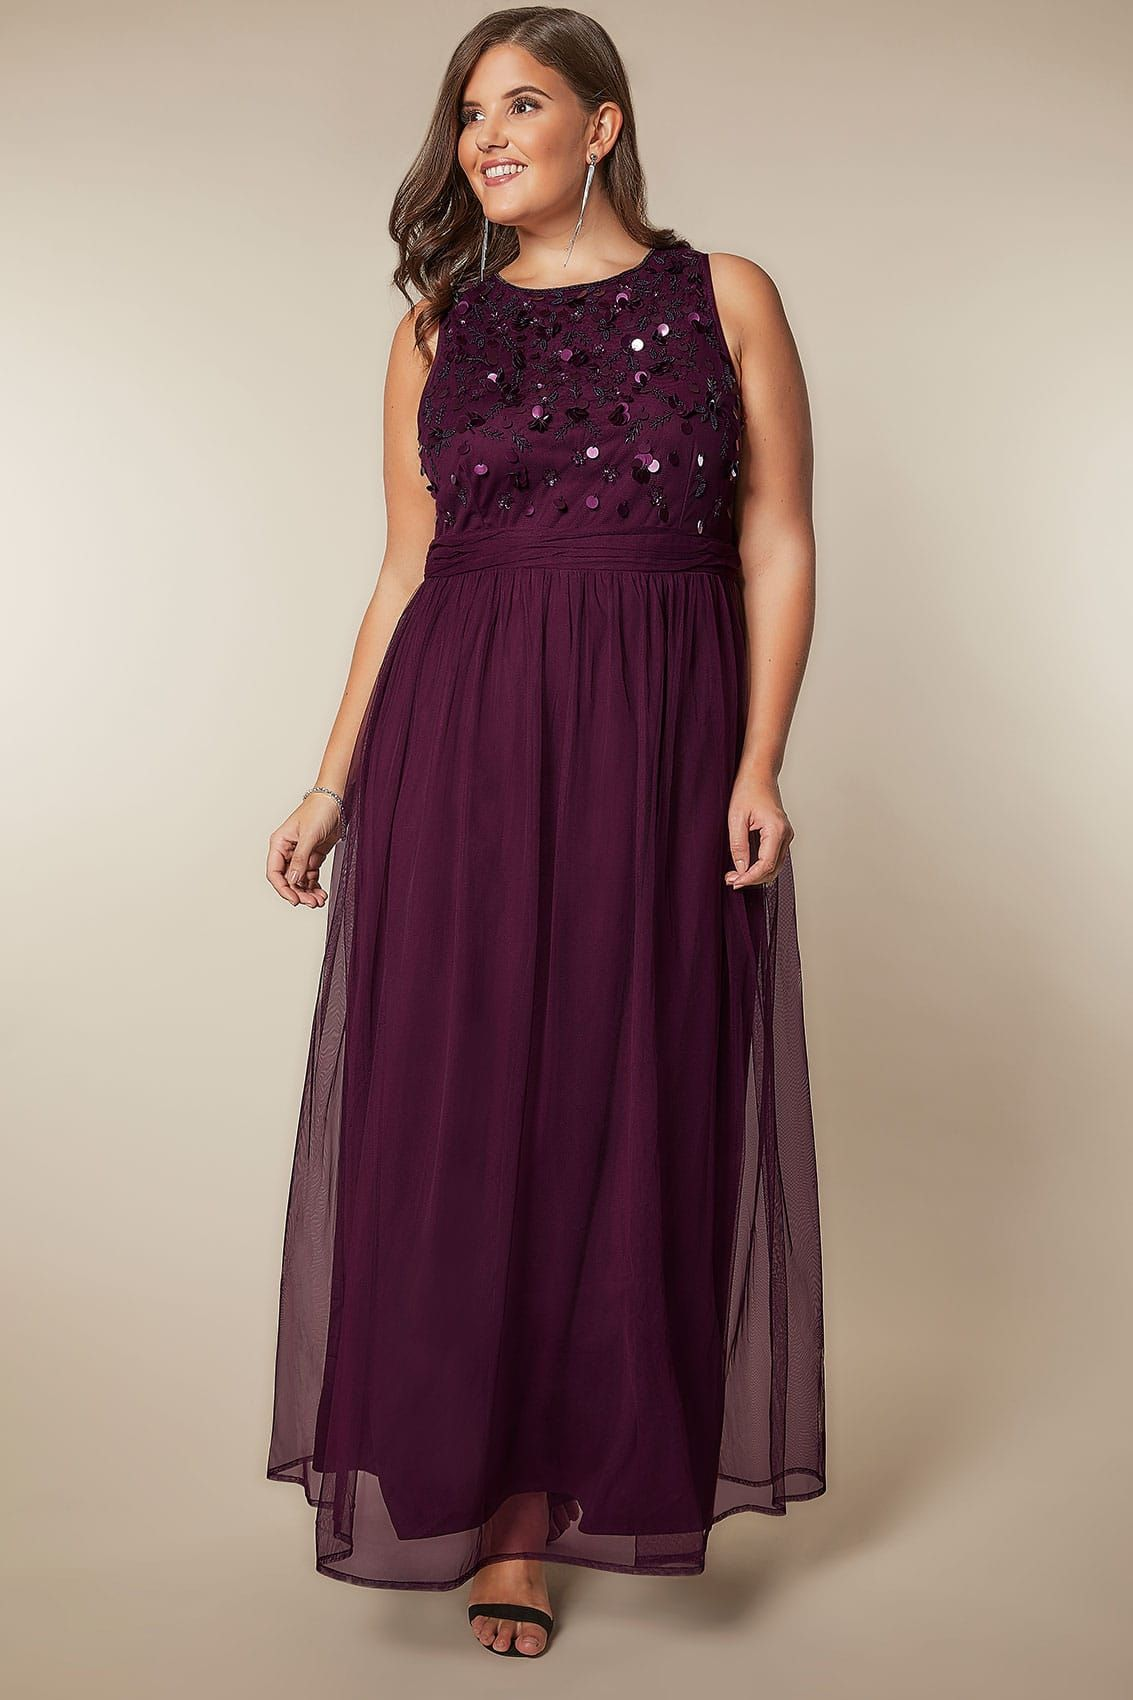 Luxe dark purple bead sequin embellished maxi dress